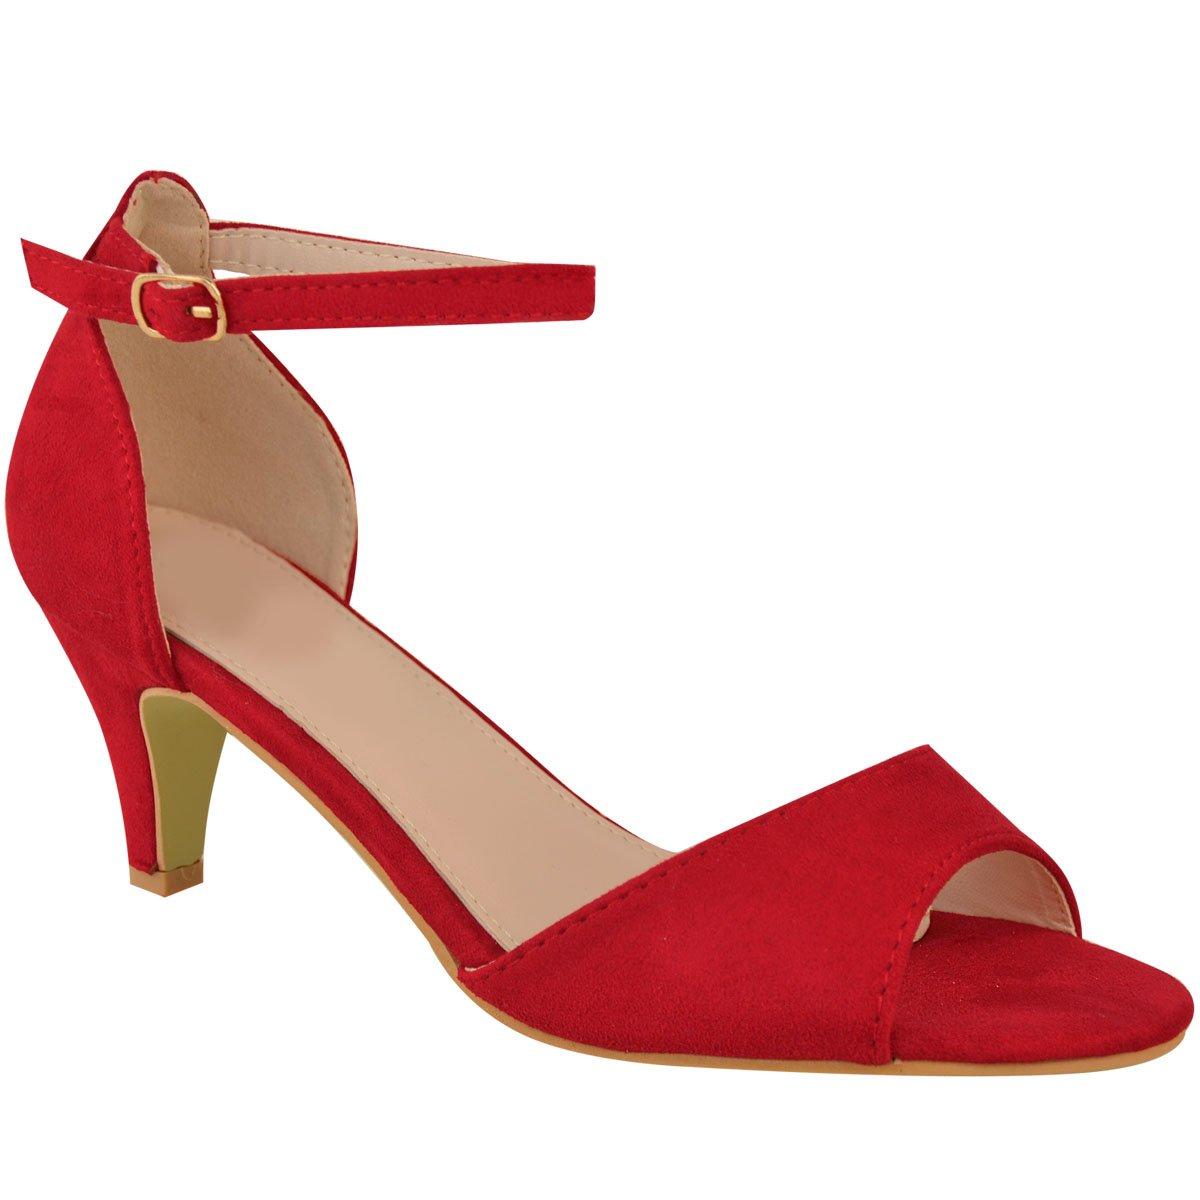 Fashion Thirsty Heelberry/® Womens Ladies Low Kitten Heel Wedge Court Shoes Black Work Sandals Strappy Size